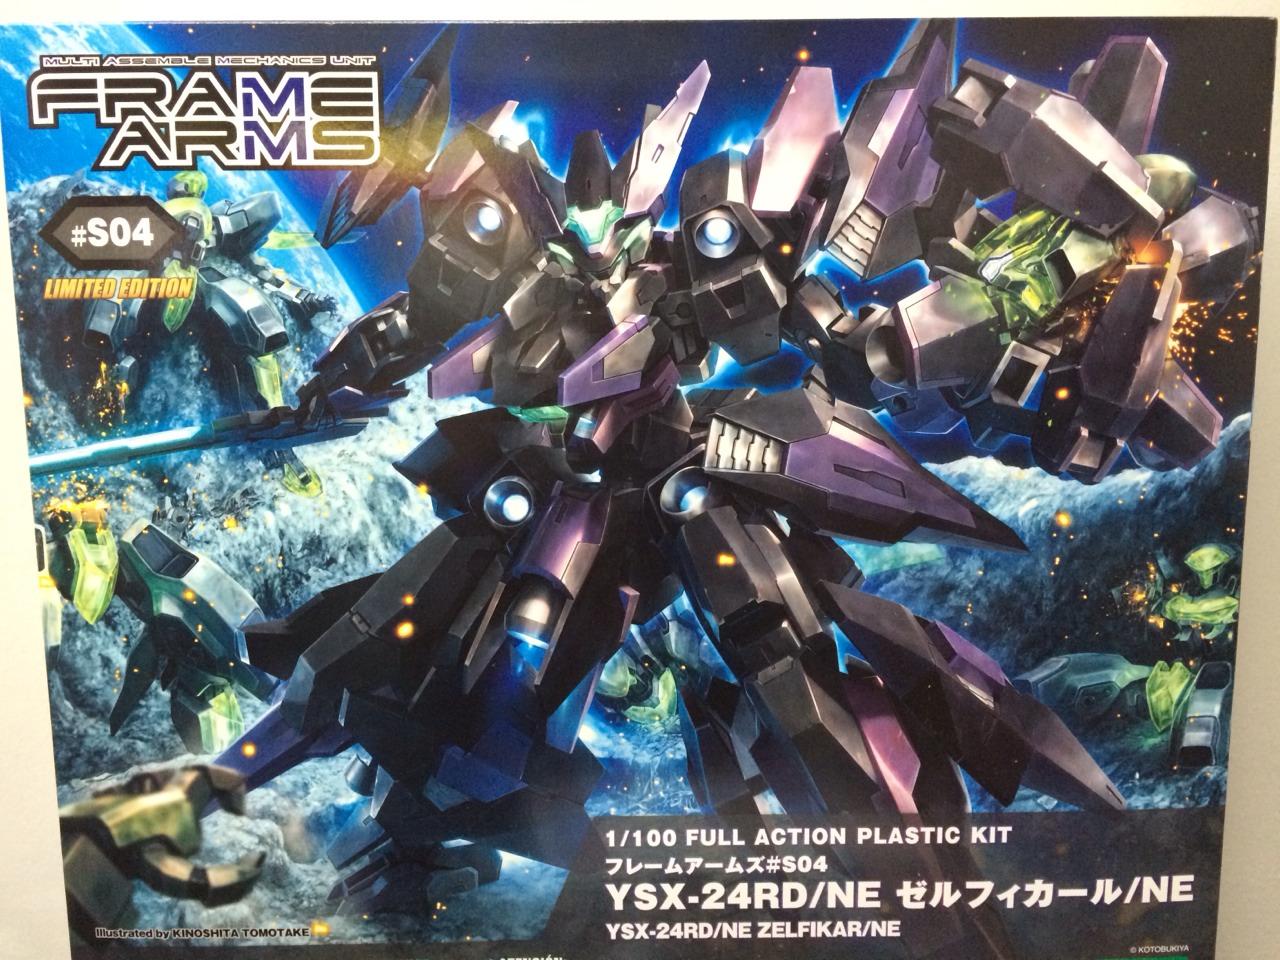 Frame Arms 1/100 #S04 YSX-24D/NE Zelfikar / NE Kotobukiya Model Kit